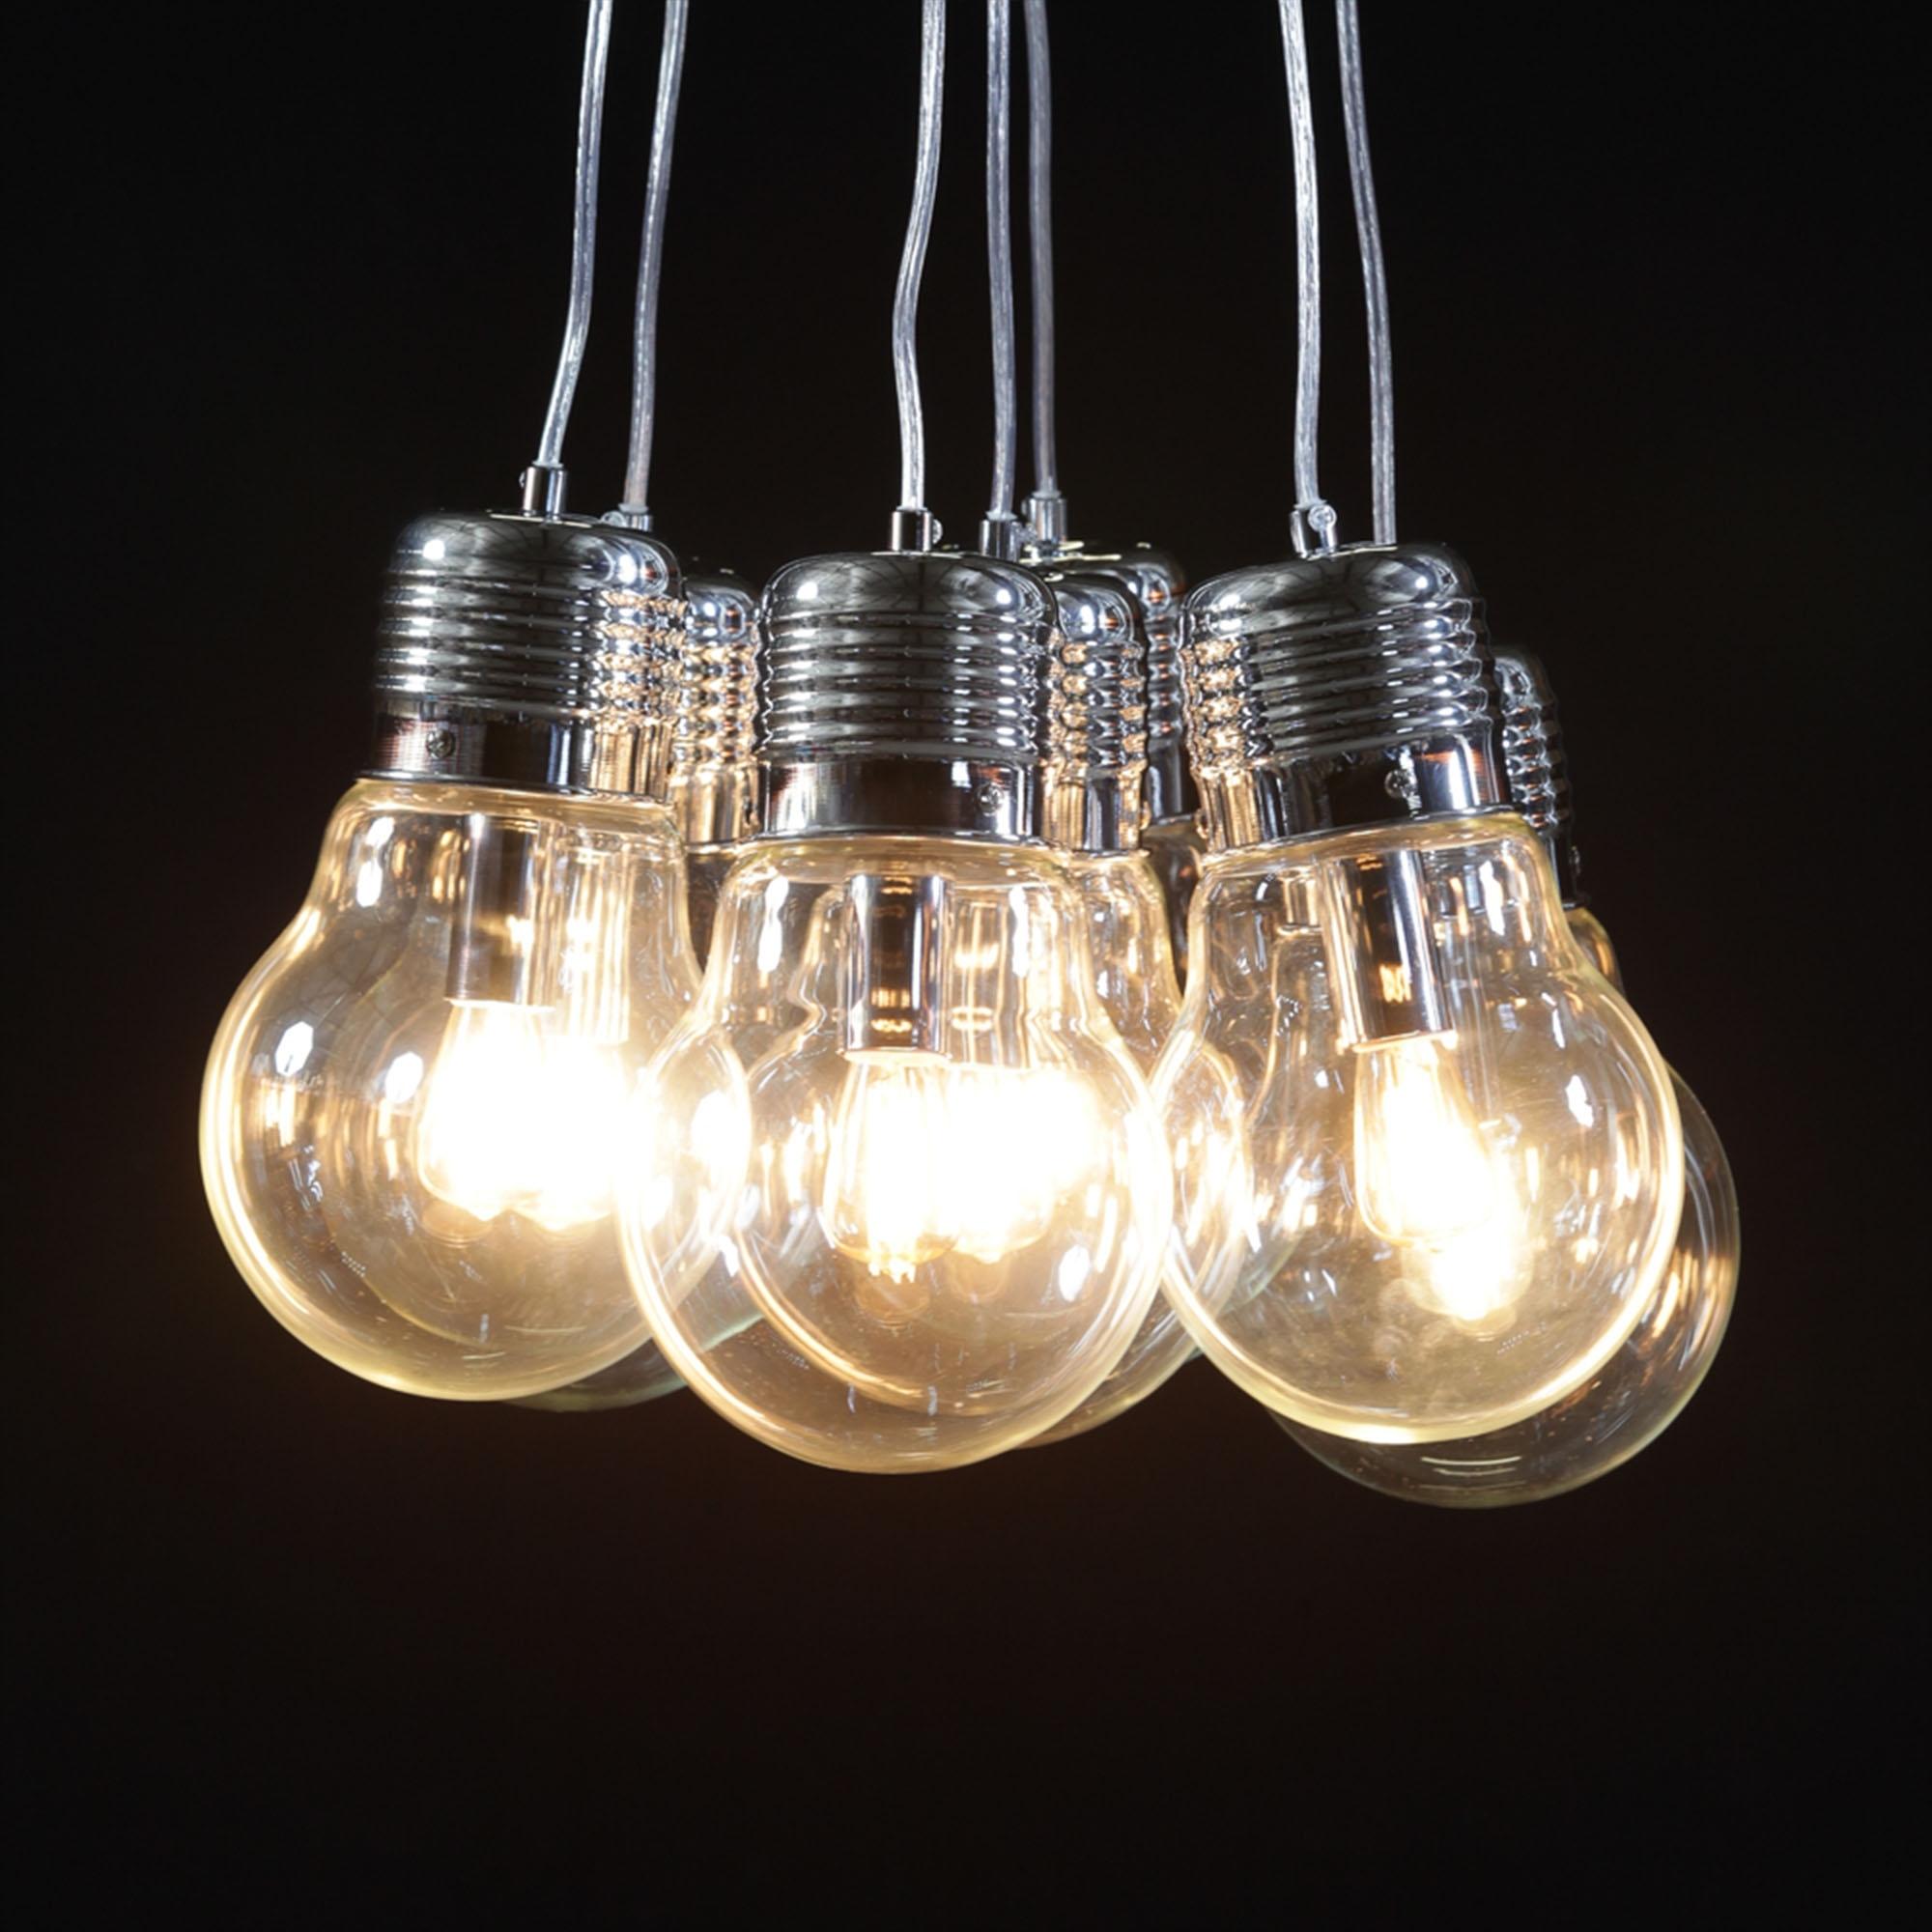 glass chandelier bulb bottle fixture light idea photo inspiration drinkware images energy en lighting free incandescent yellow lamp